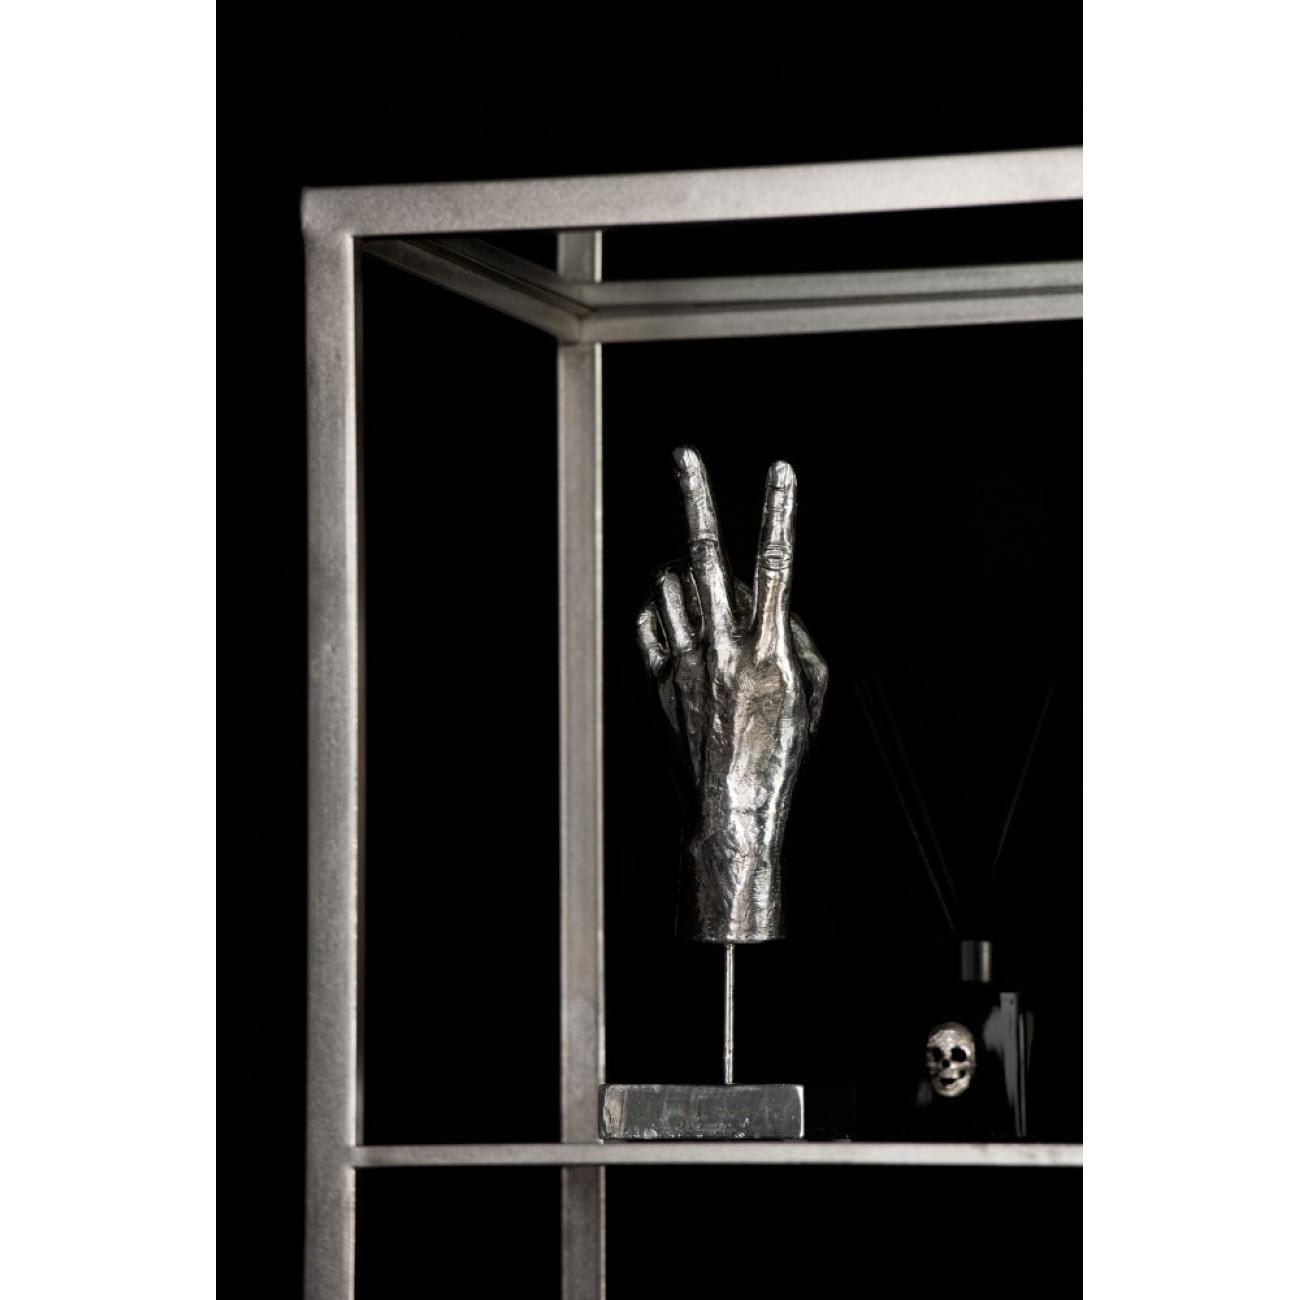 Статуэтка  J-LINE рука жест Победа, Мир, peace серебристого цвета высота 36 см